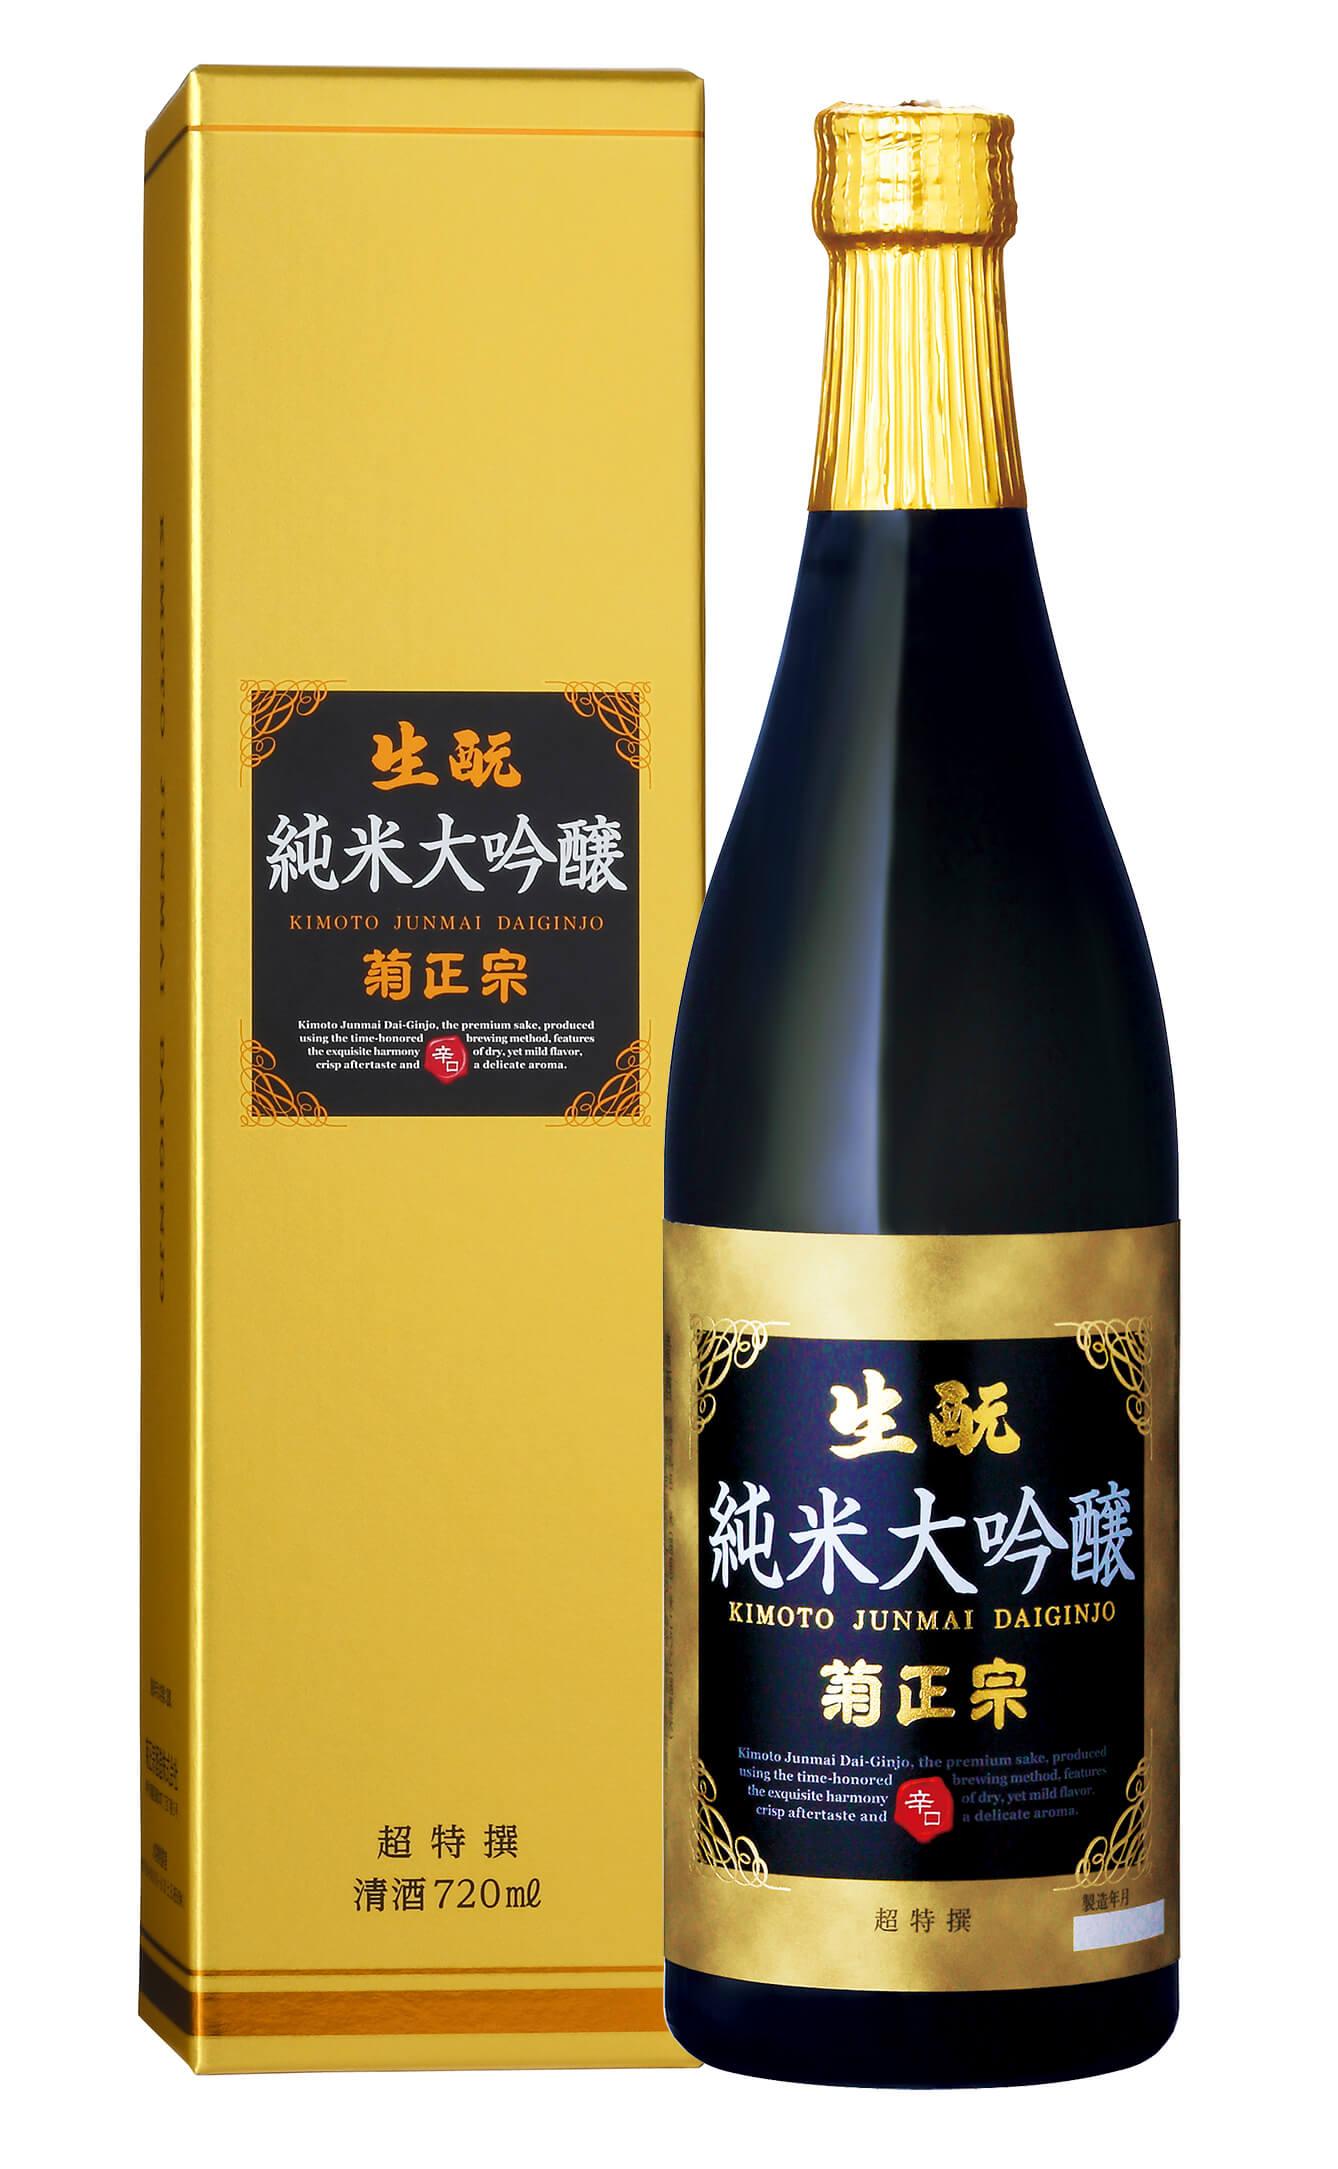 Kiku Masamune Kimoto Junmai Daiginjyo Sake